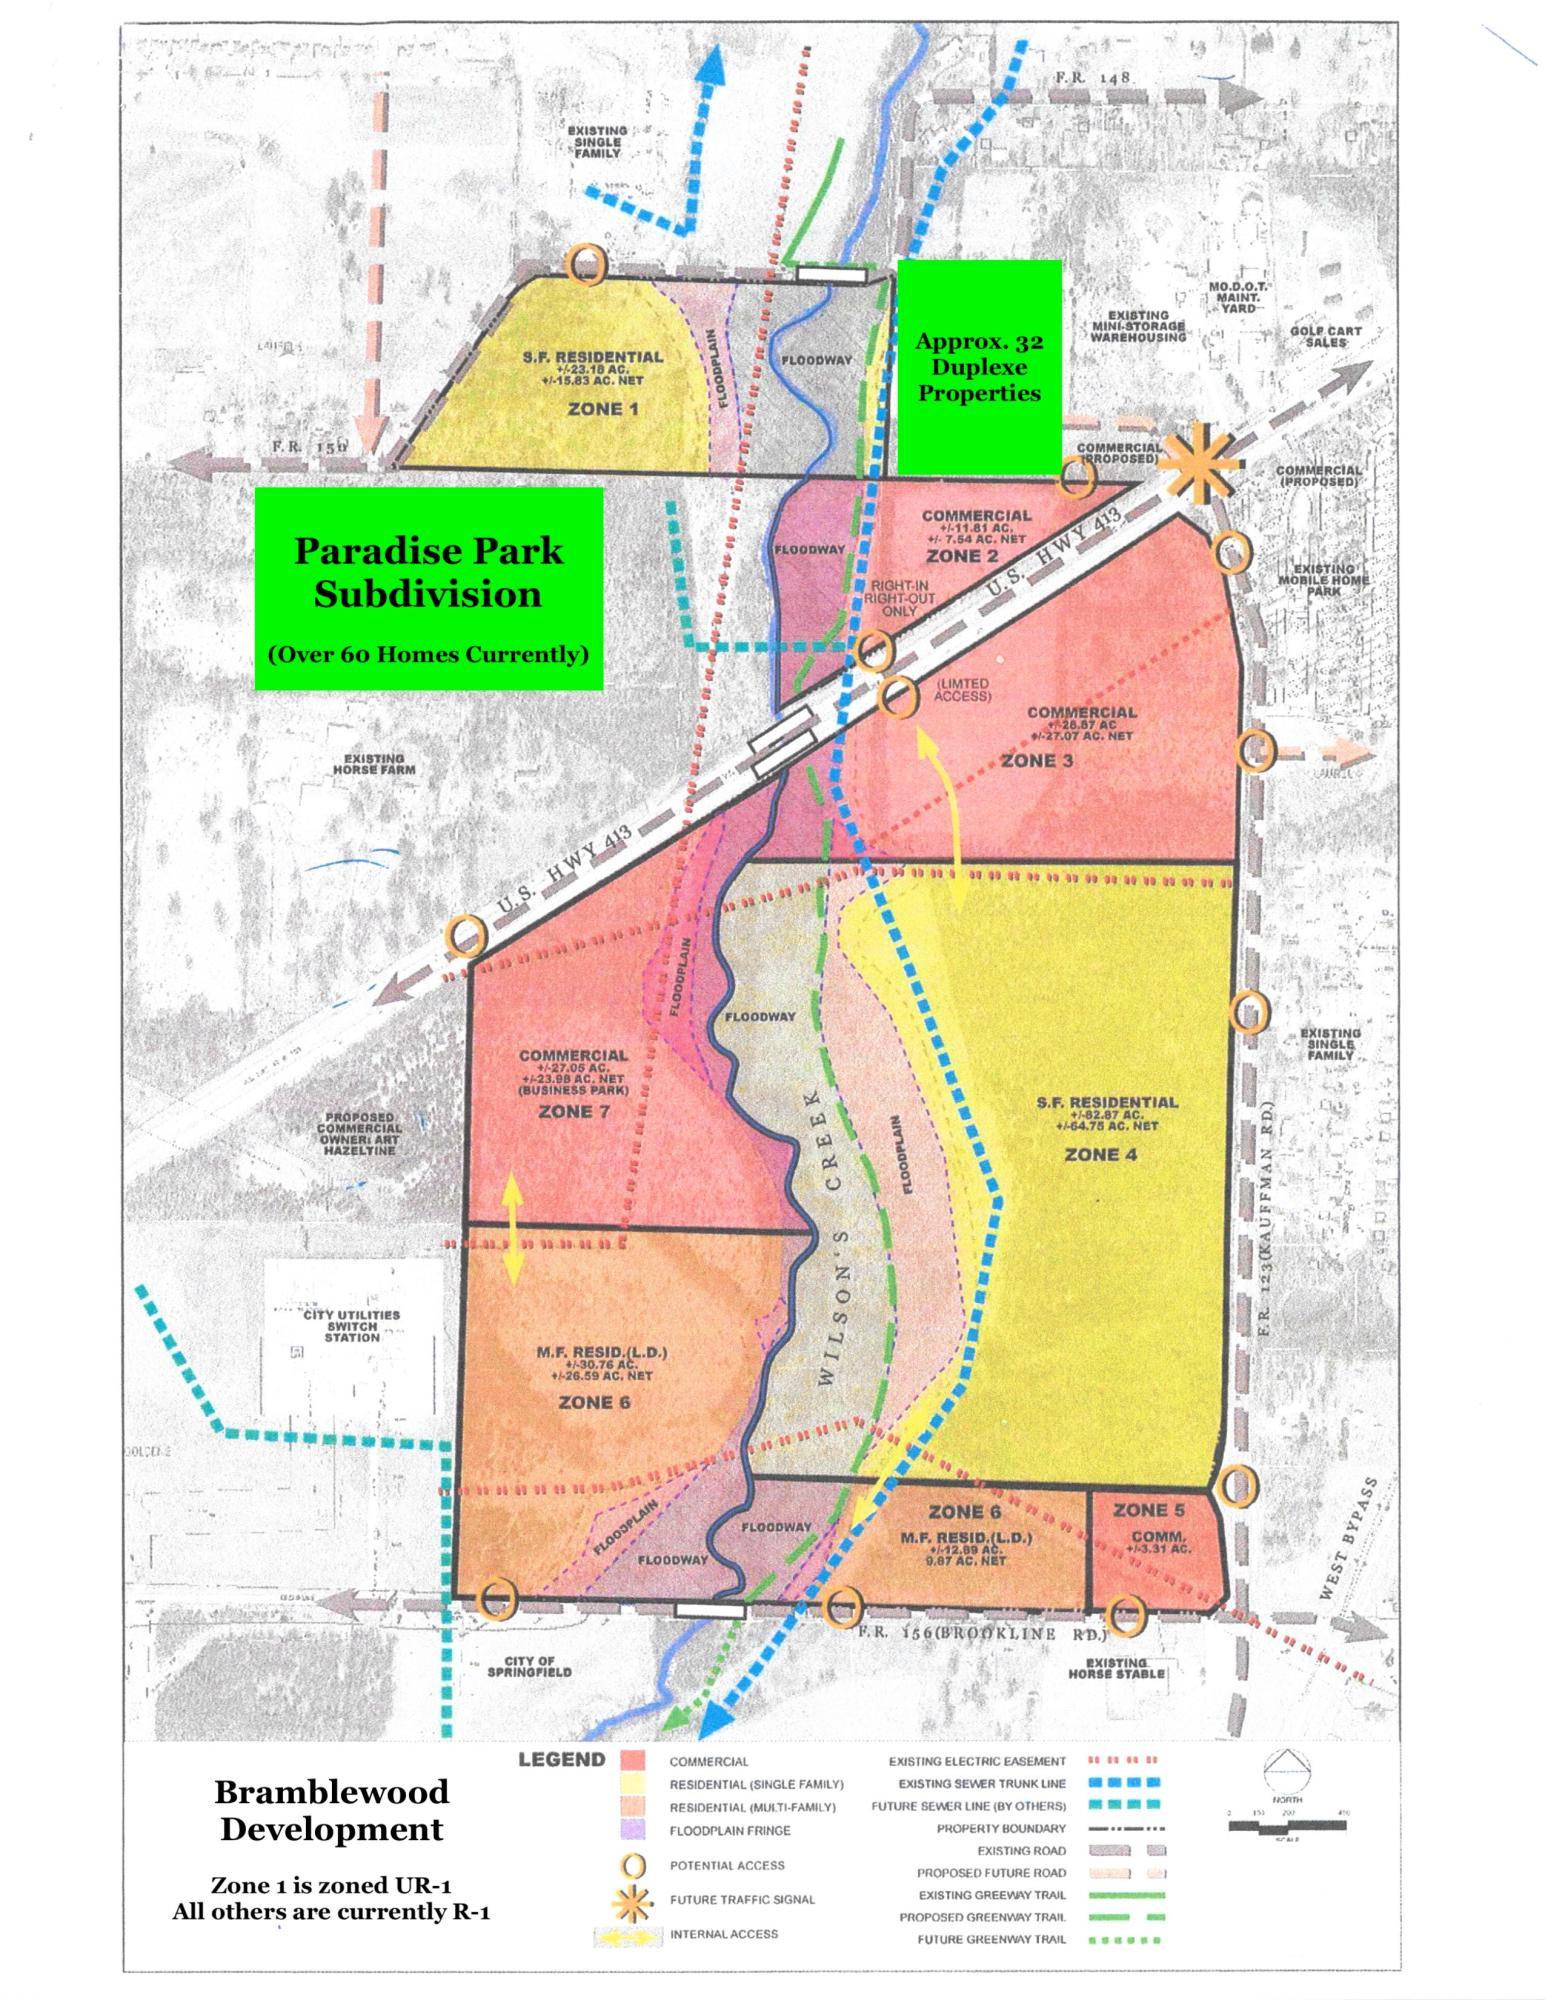 0000 South Farm Road 123 UNIT Zone 4 Springfield, MO 65807